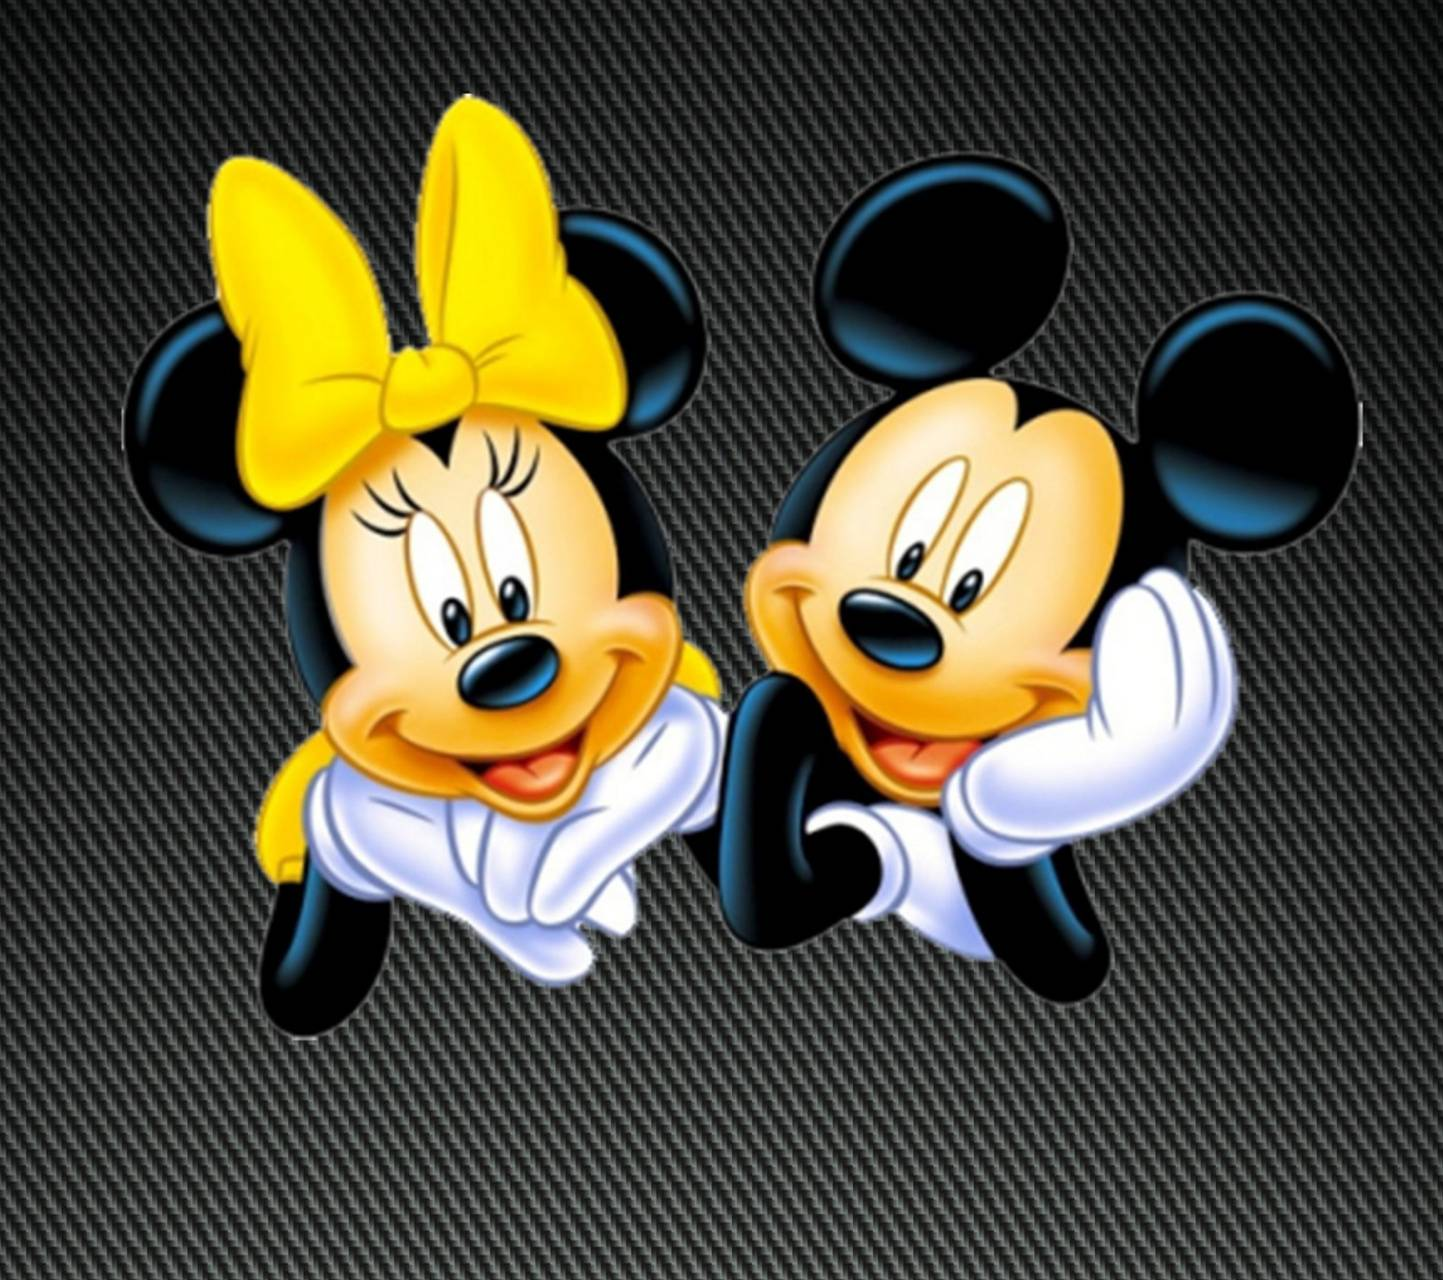 Mickey Minnie Wallpaper By Lovey 9b Free On Zedge